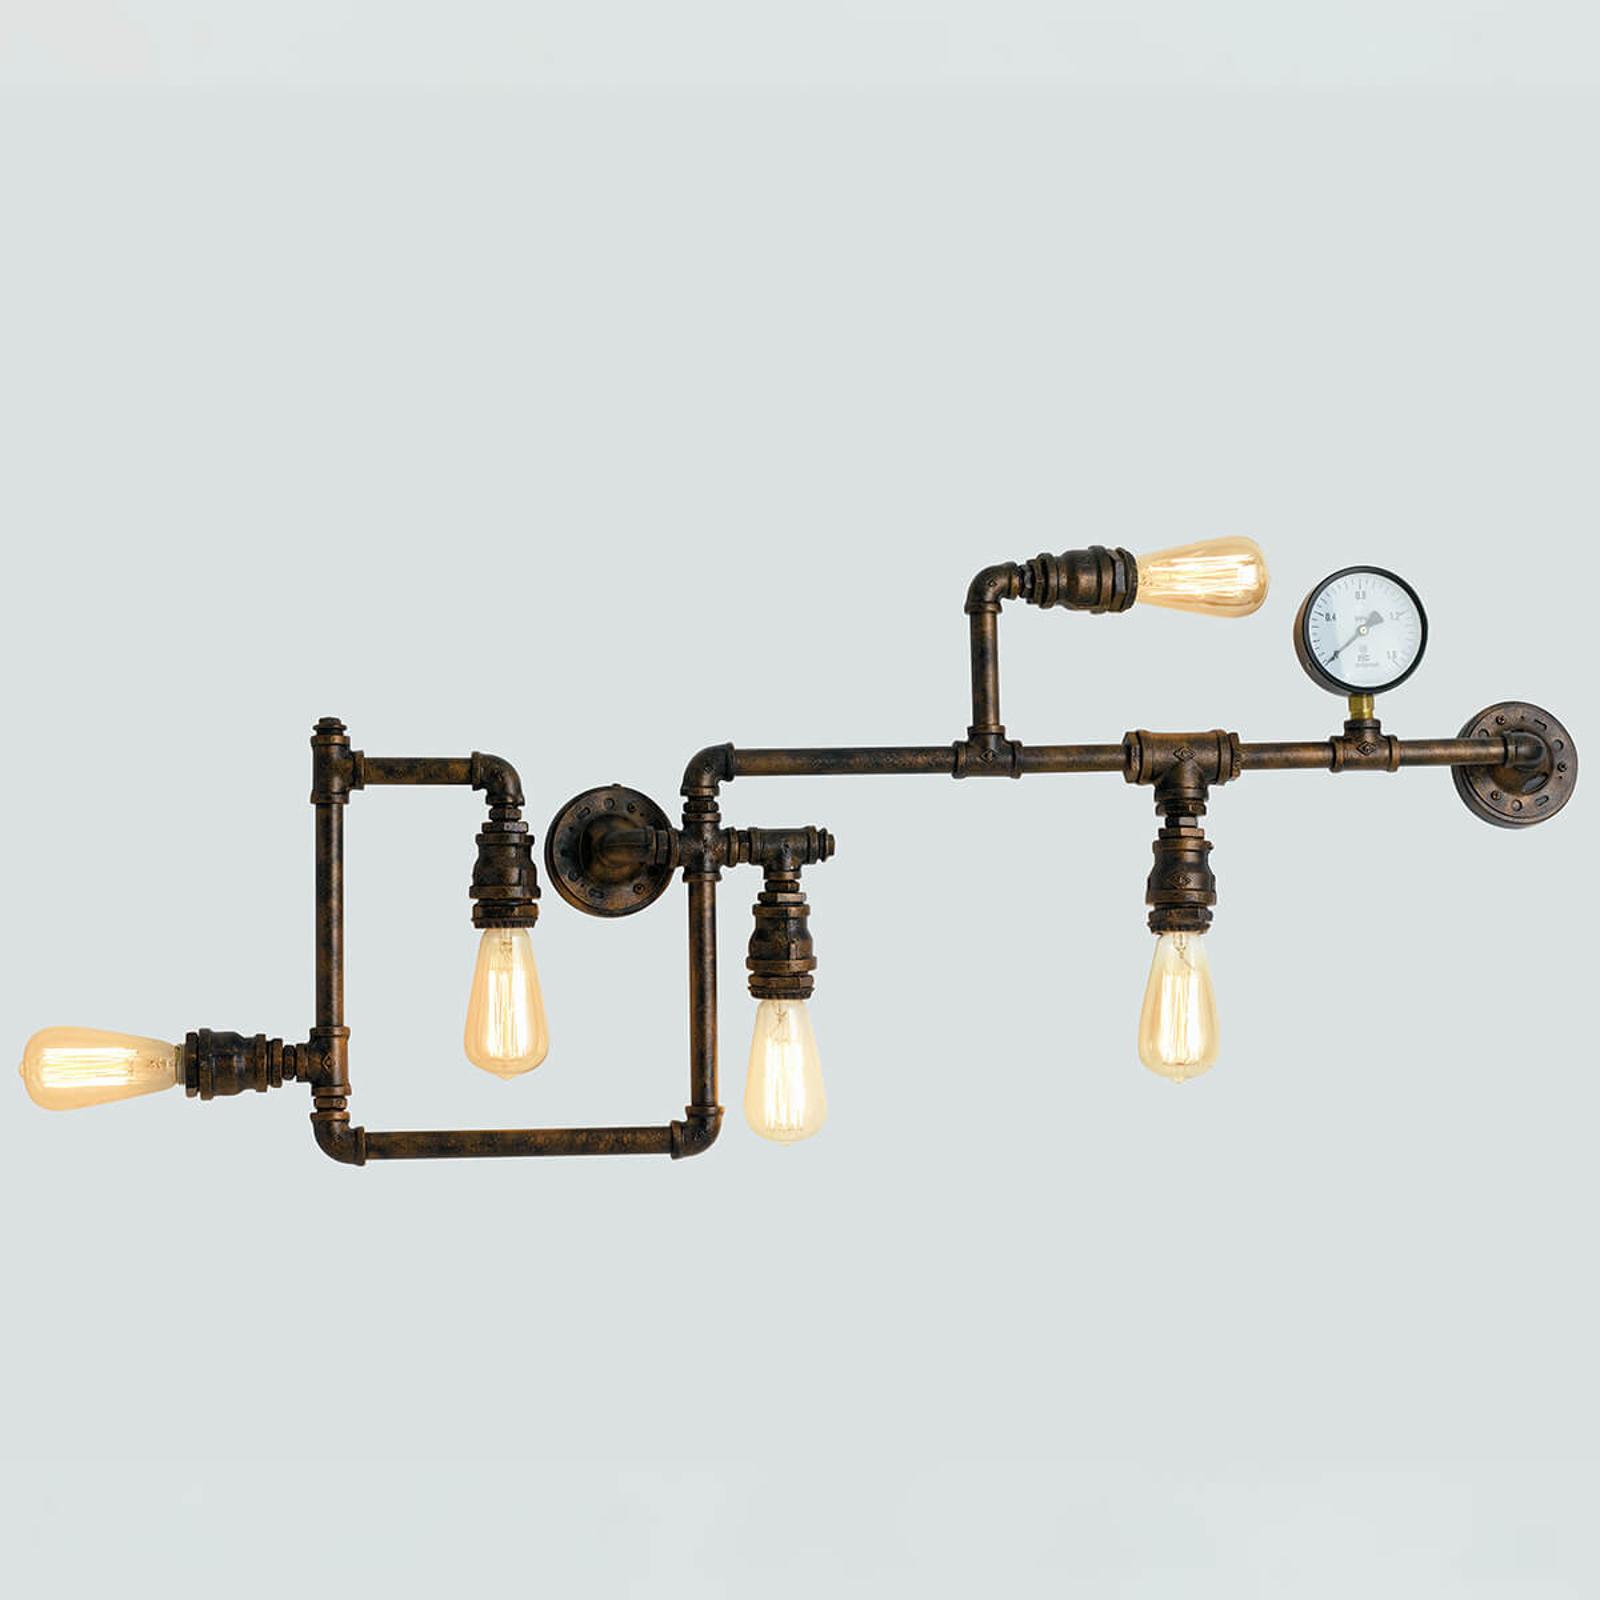 Wandlamp Amarcord, met vijf lampjes